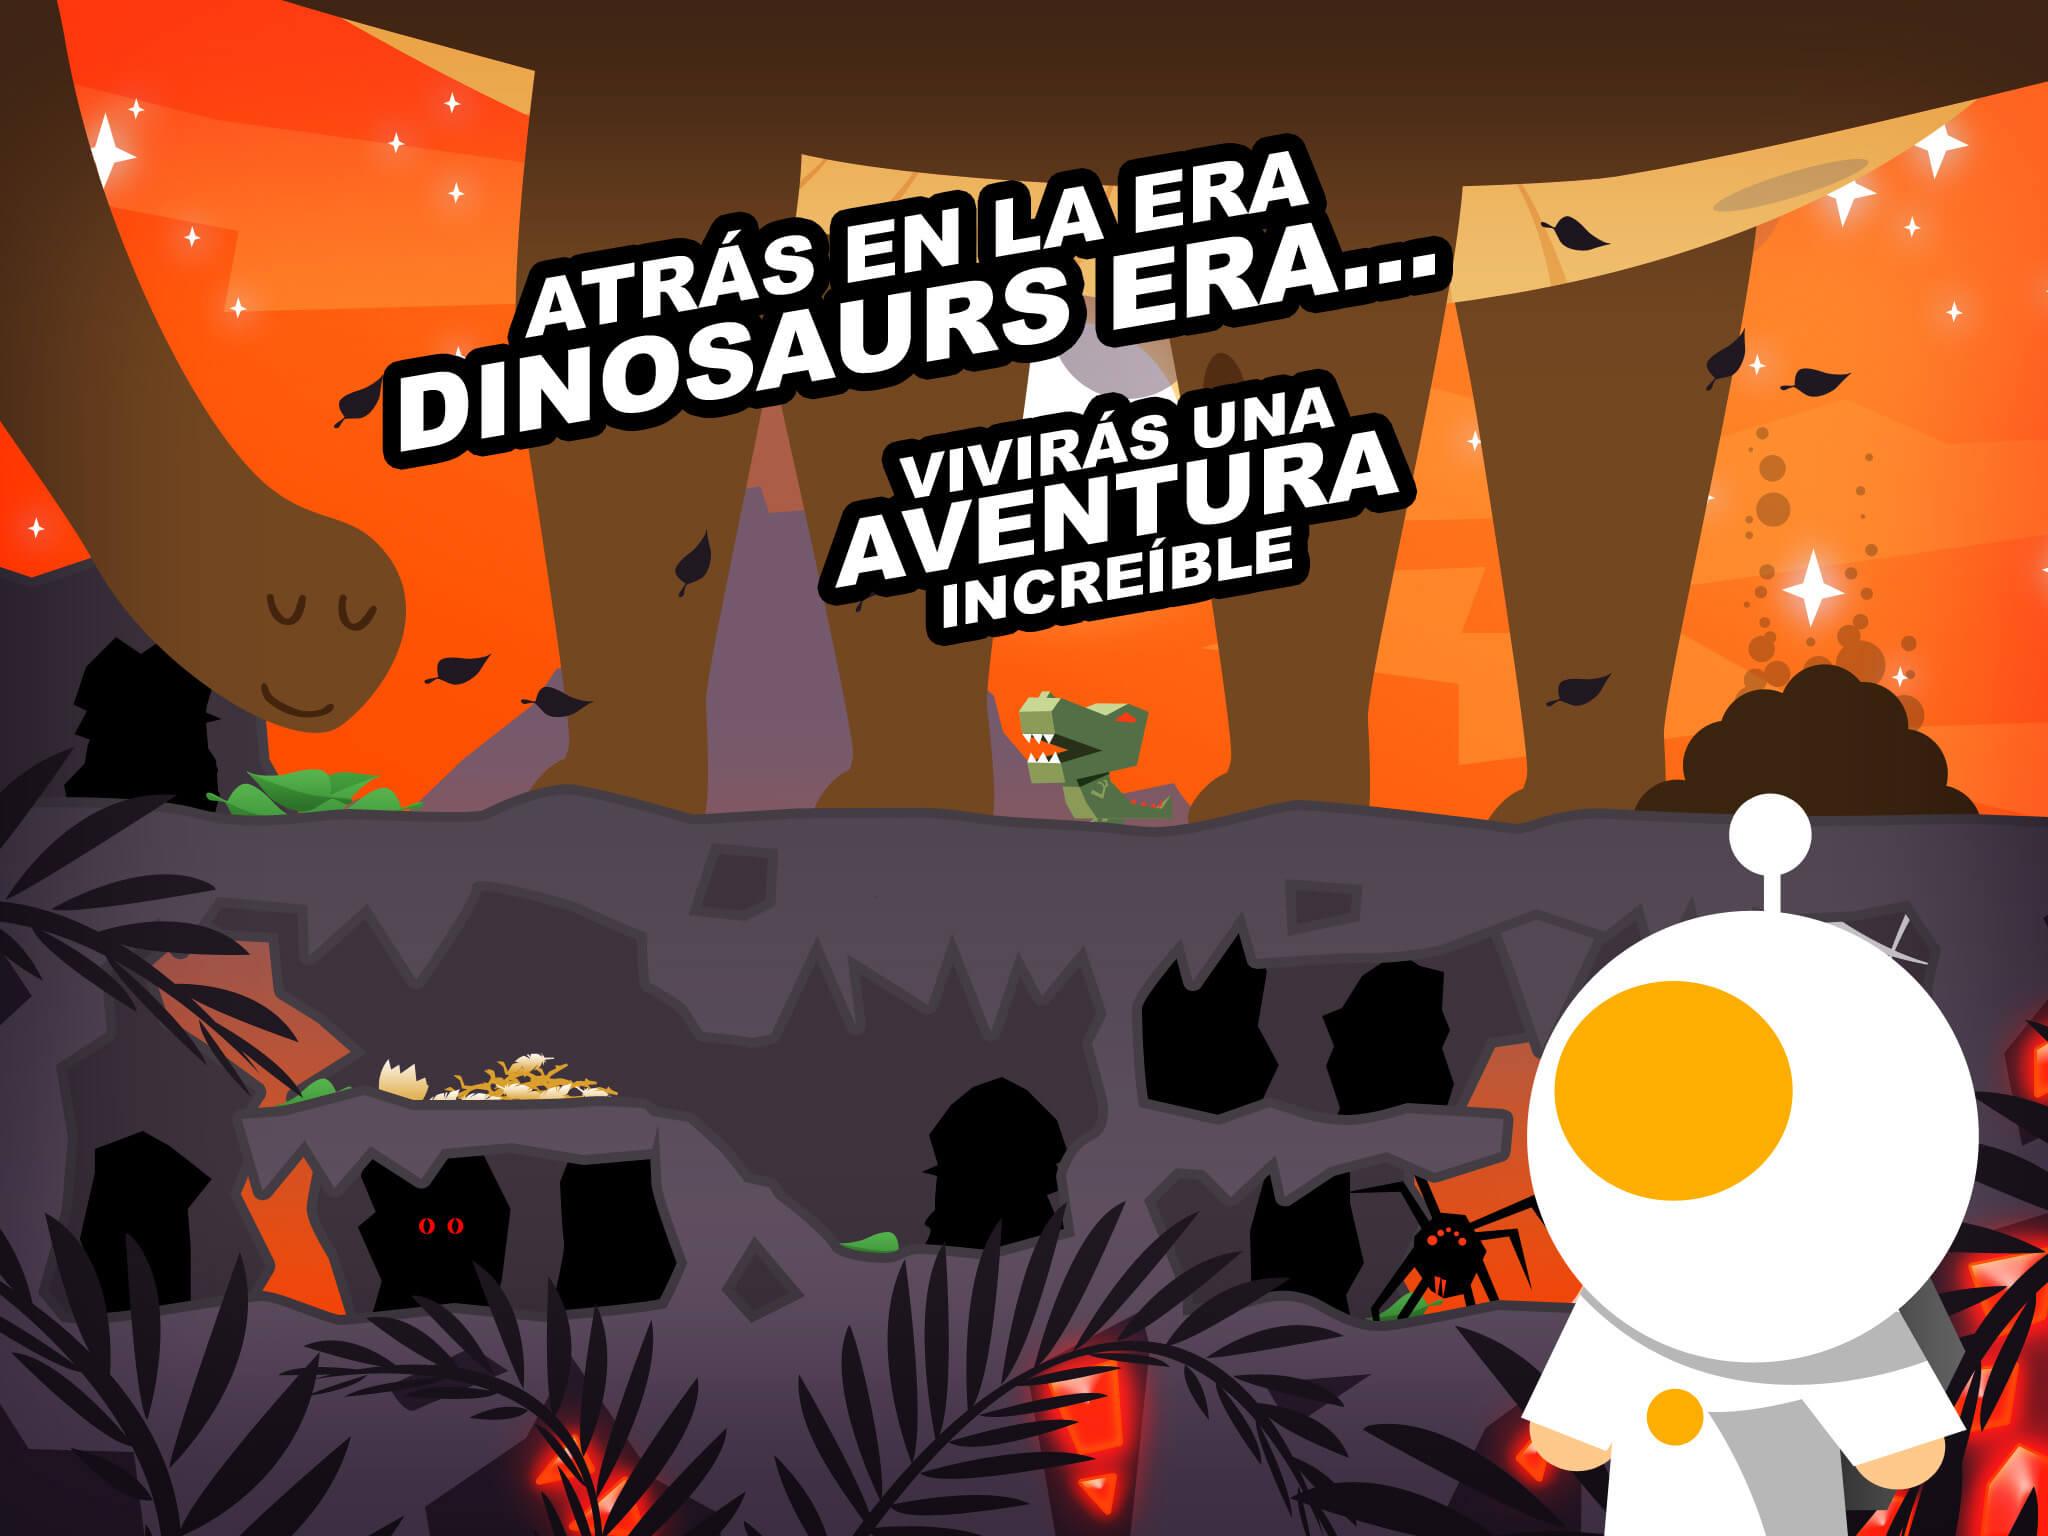 prehistoric_screenshot_02_es